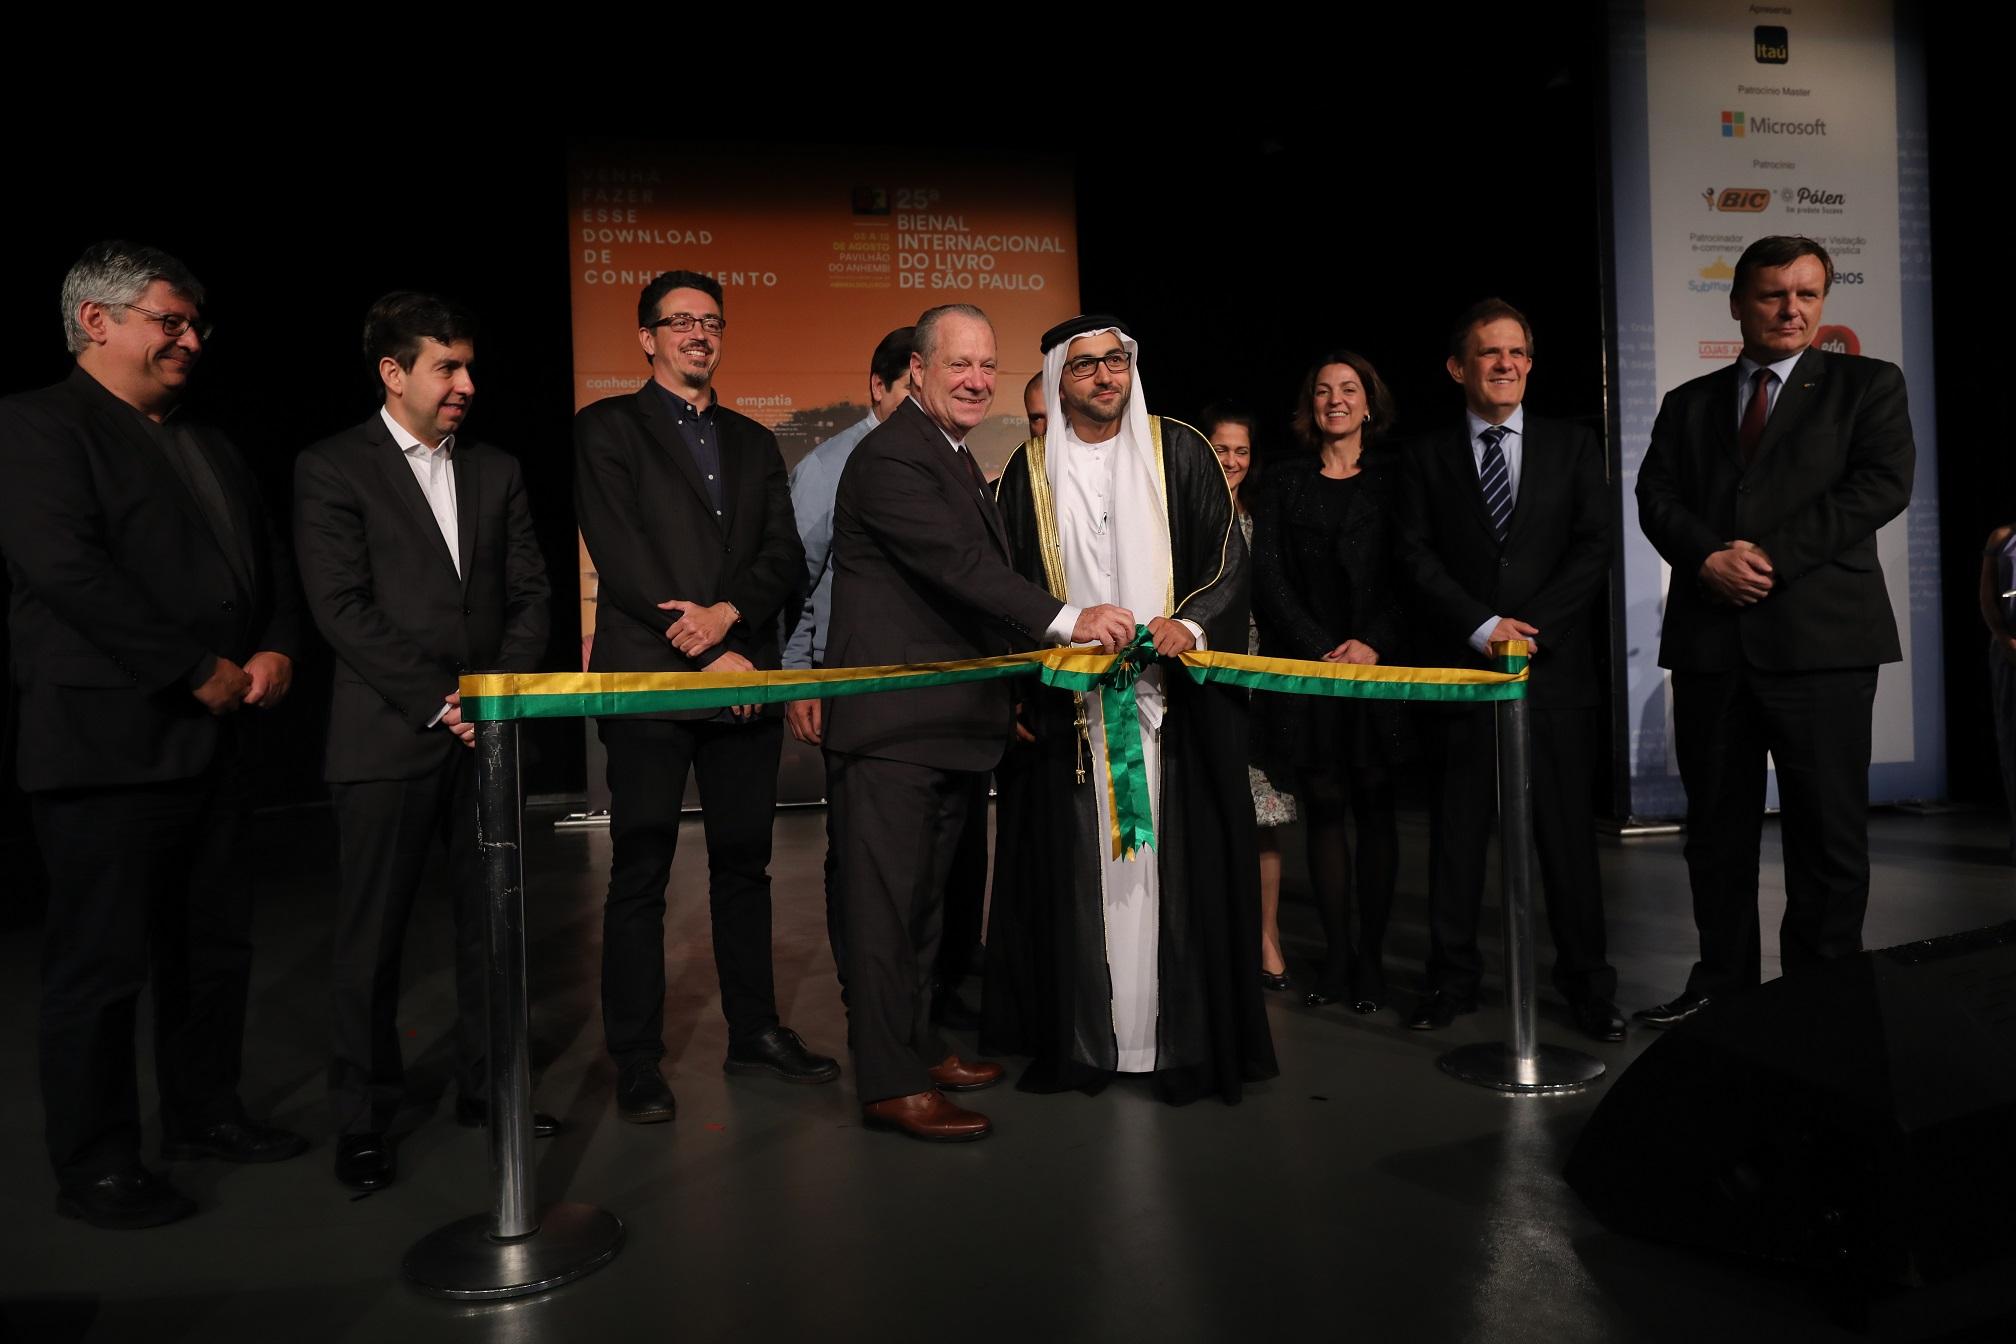 Luís Antonio Torelli (esq., cortando a fita) ao lado de Fahim Al Qasimi, de Sharjah